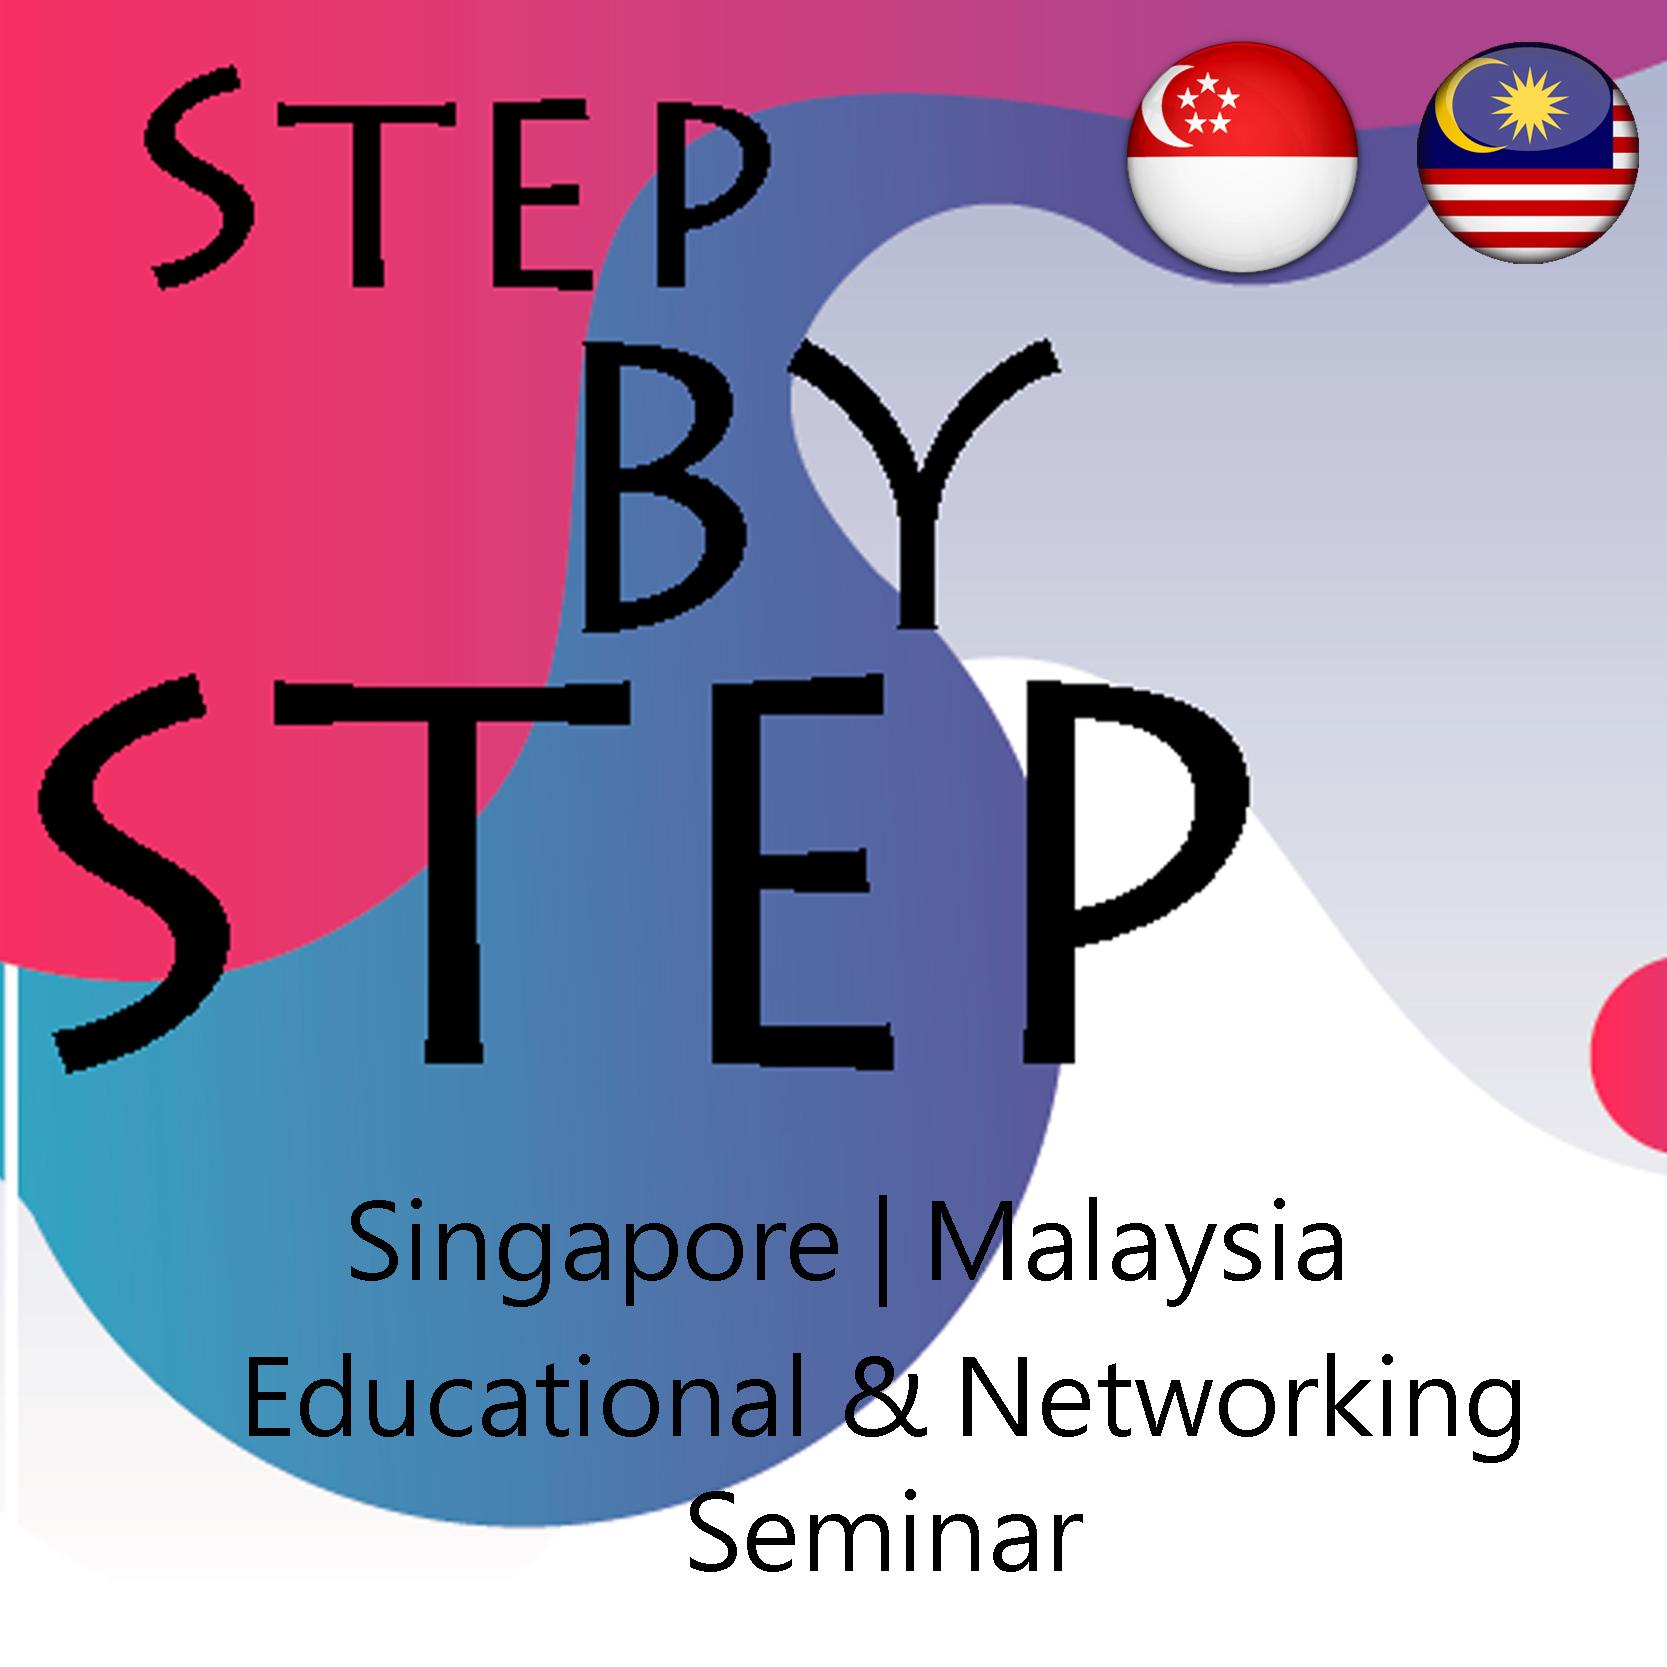 Mar 8 - Singapore & Malaysia Educational & Networking Seminar